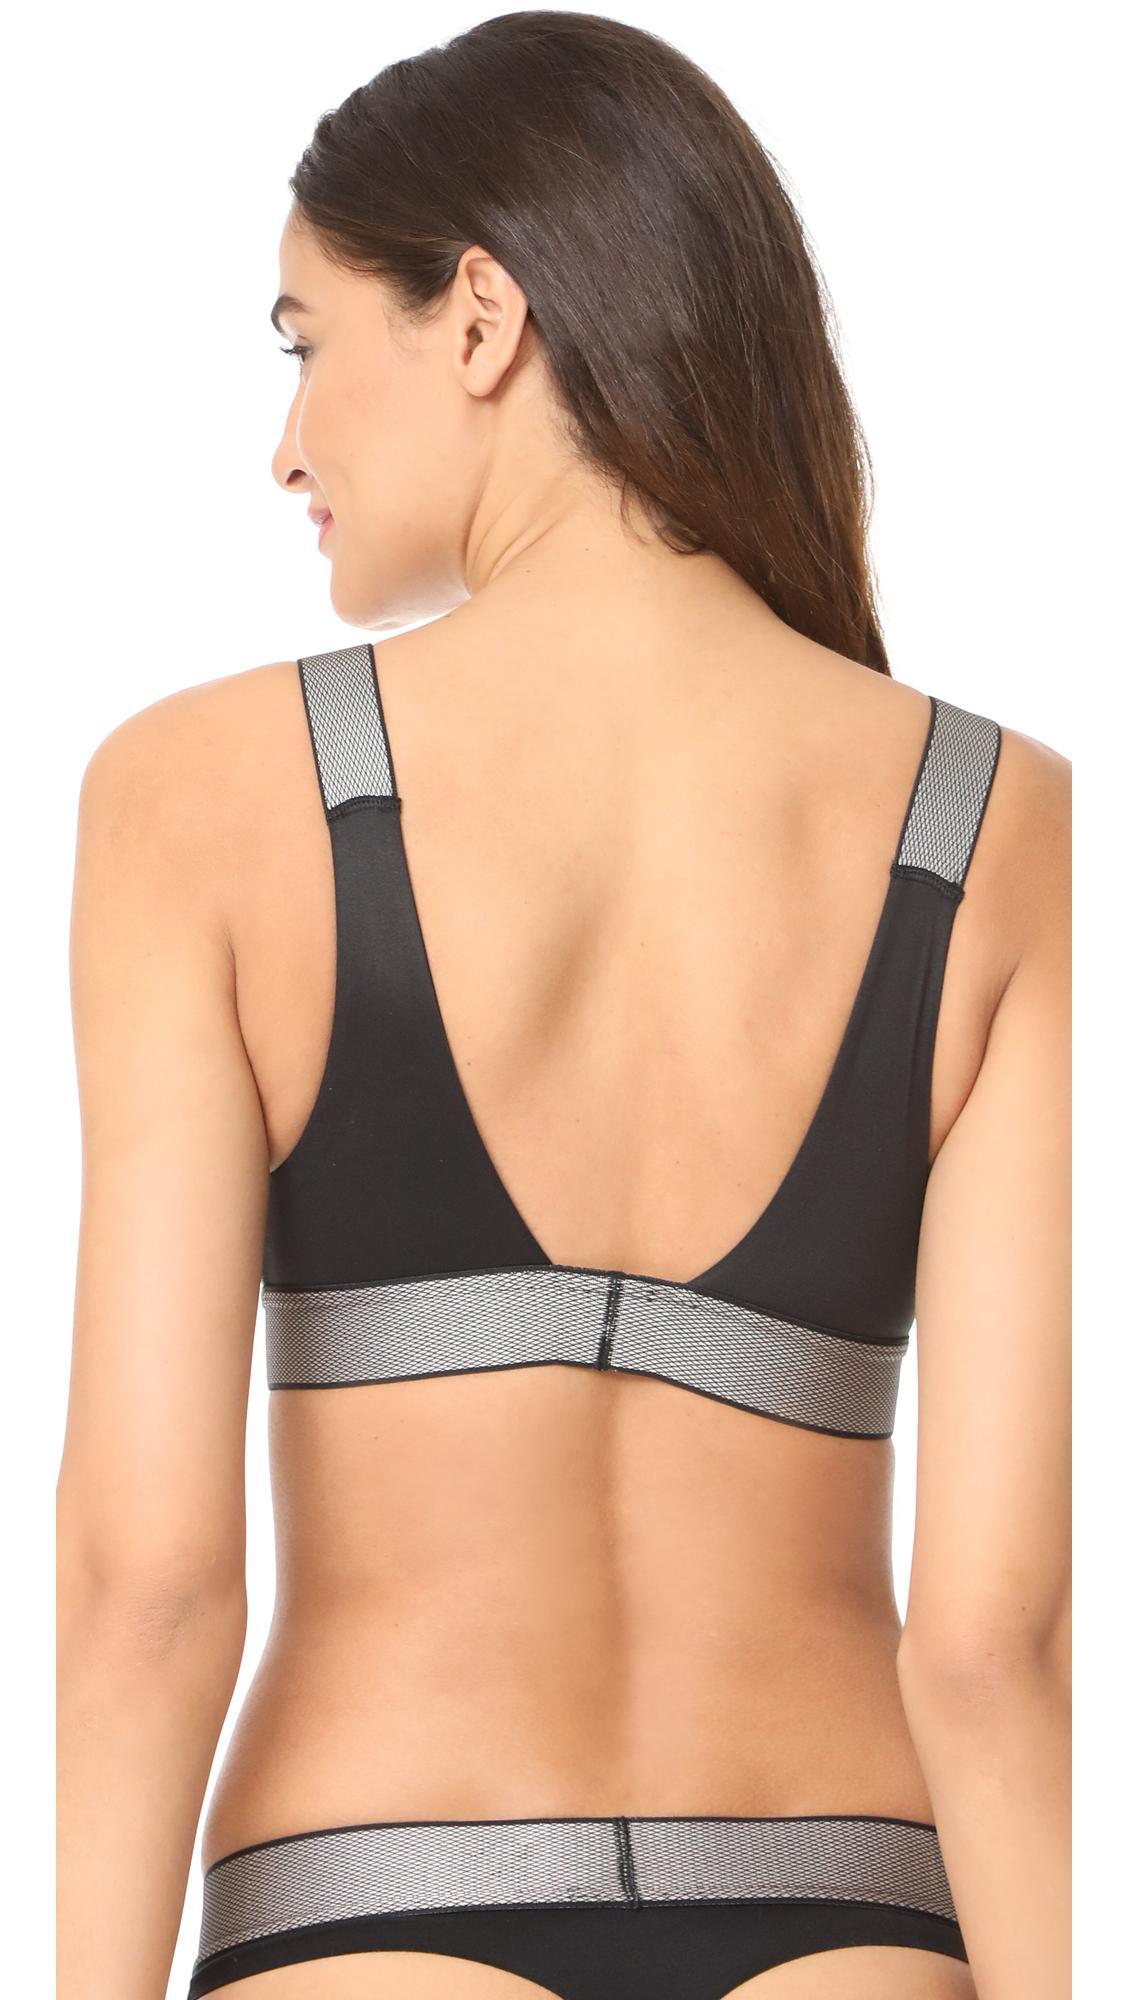 974cd69c0c0 Lyst - Calvin Klein Customized Stretch Unlined Bralette in Black